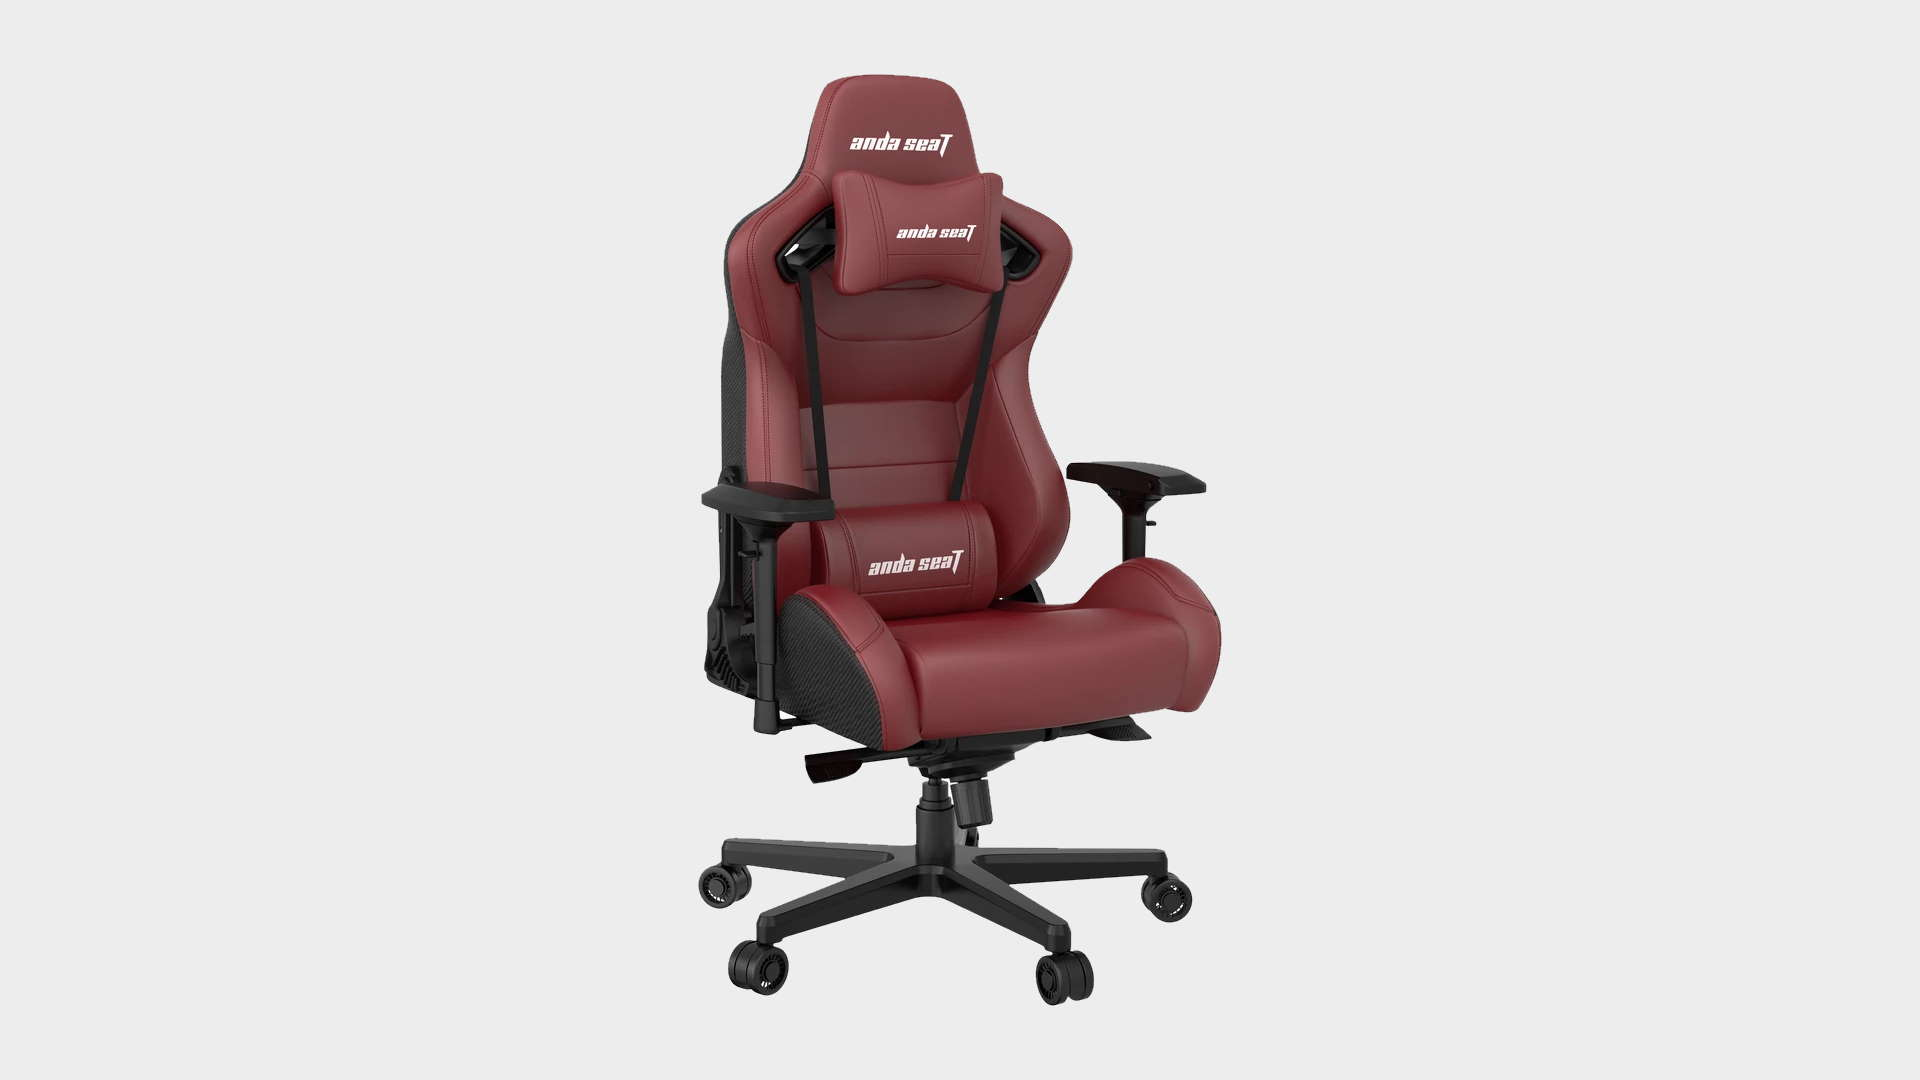 AndaSeat Kaiser 2 gaming chair in maroon